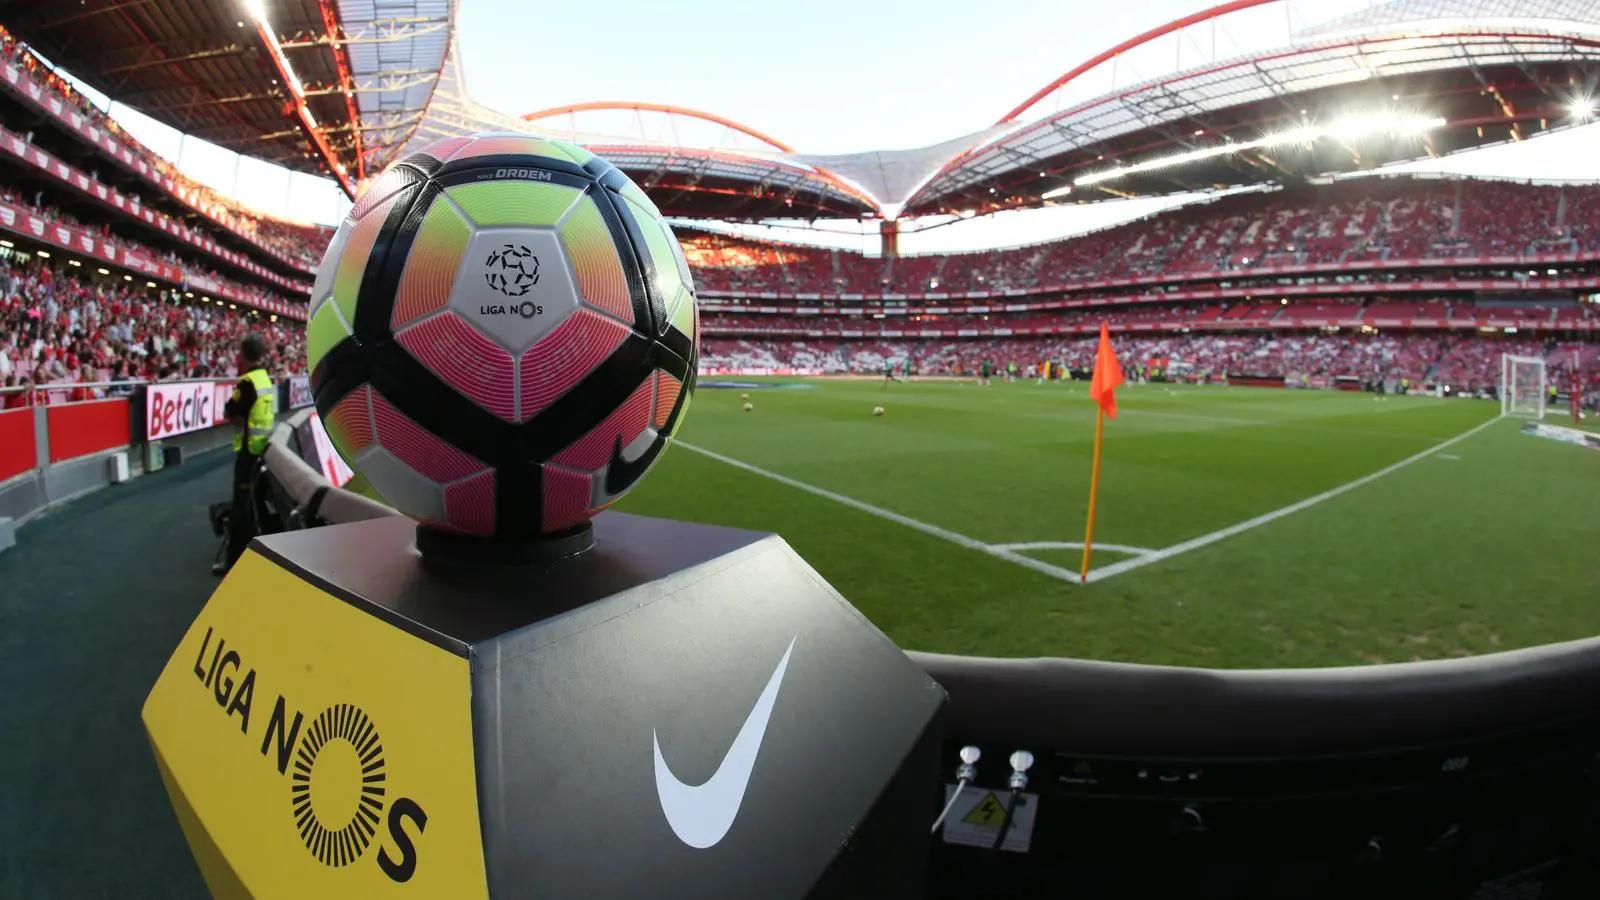 OneFootball acquista diritti per partite in diretta e highlights di 12 diversi campionati